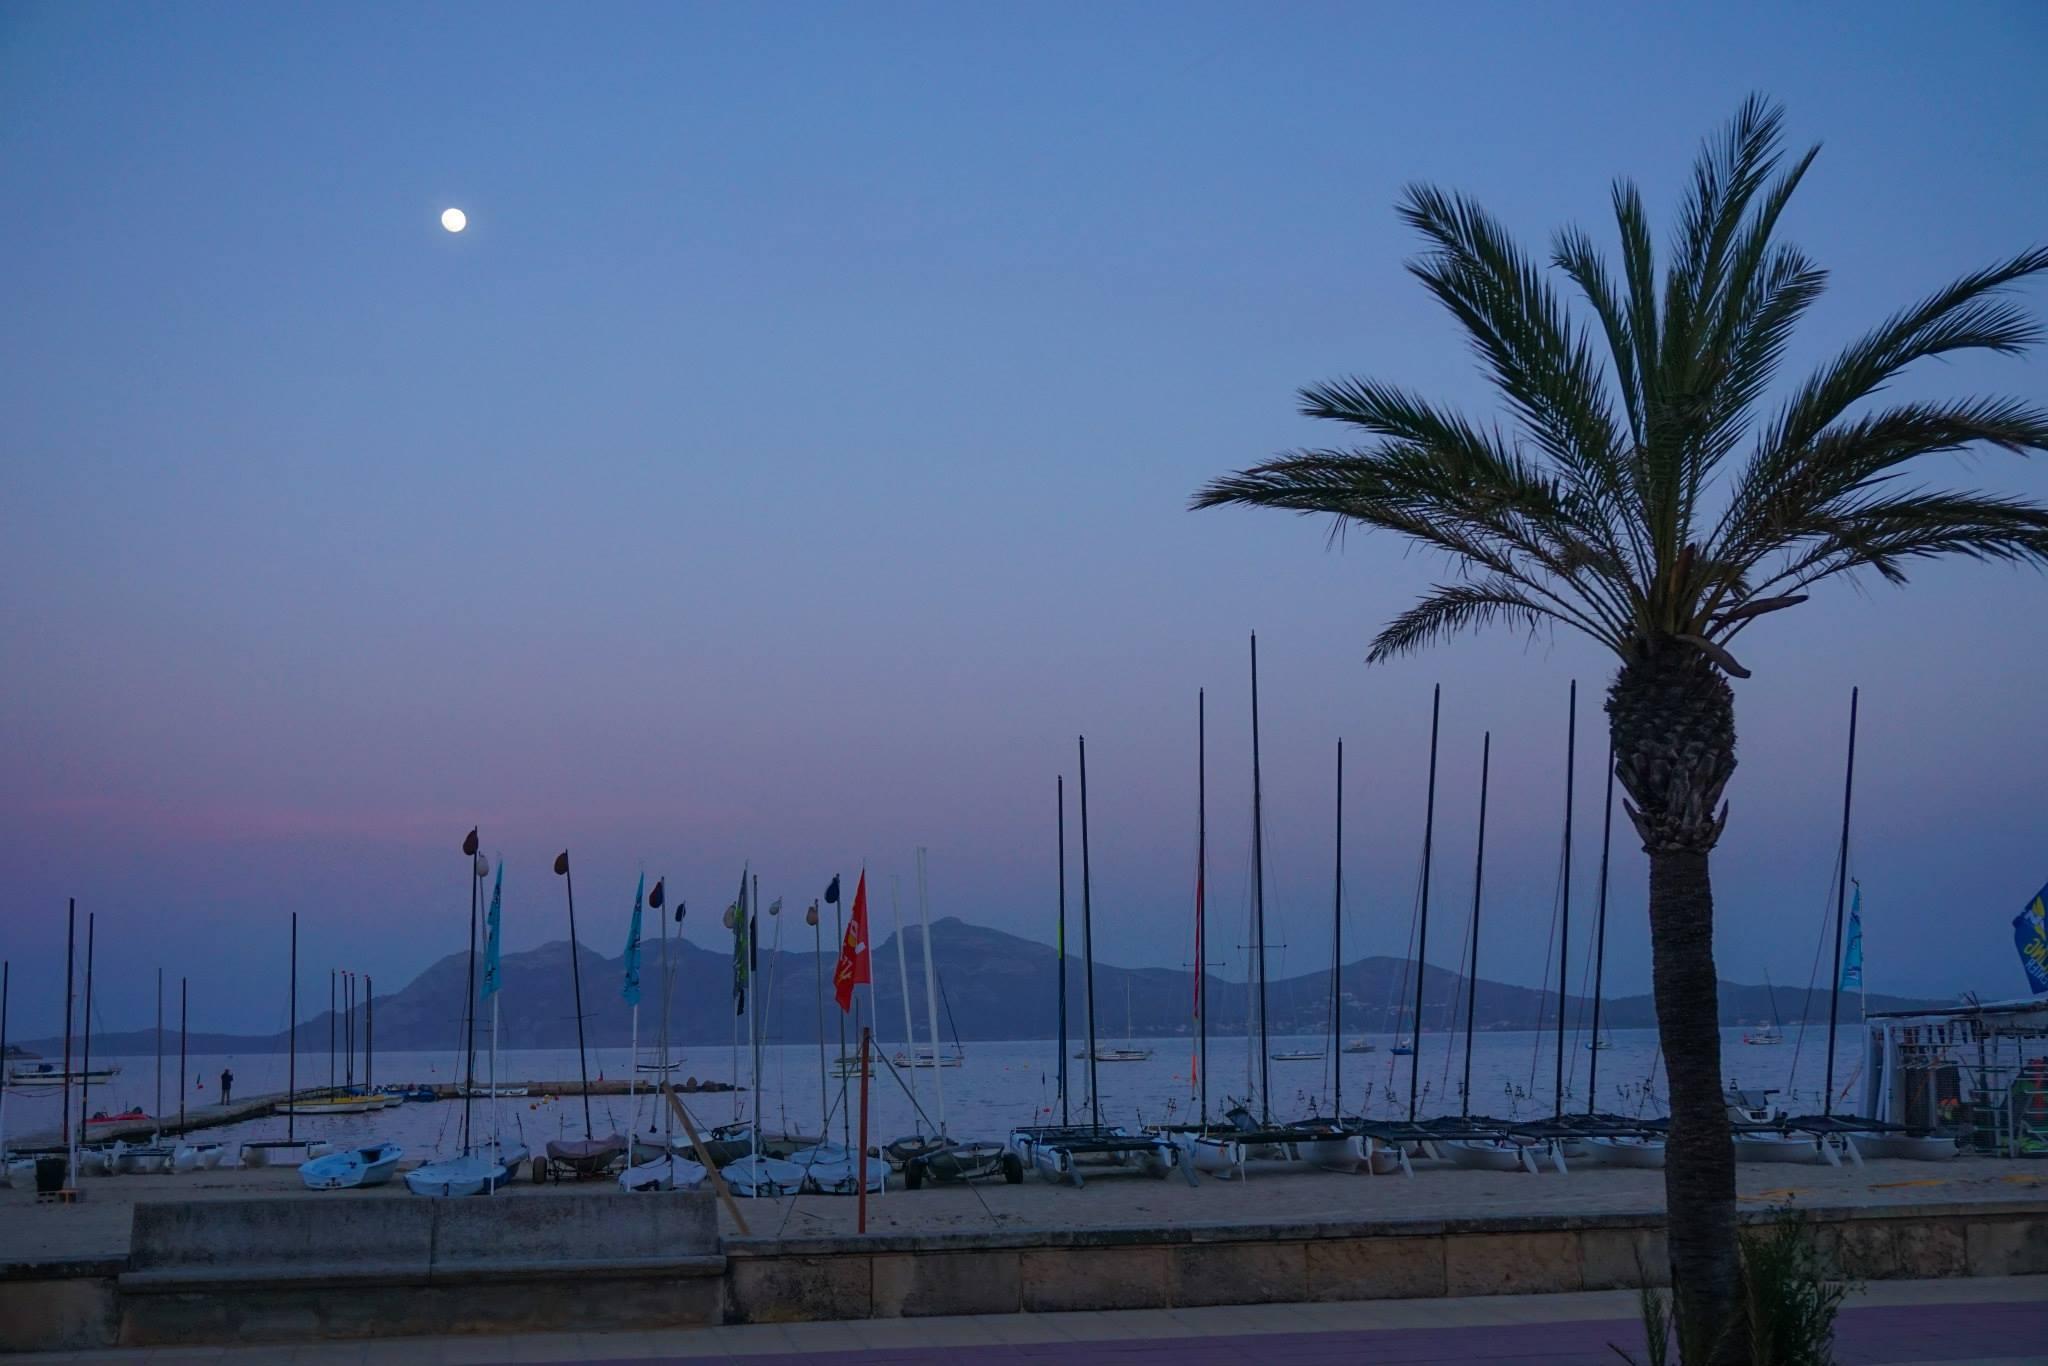 Pollensa Bay moon seen at cycling camp in Mallorca Spain